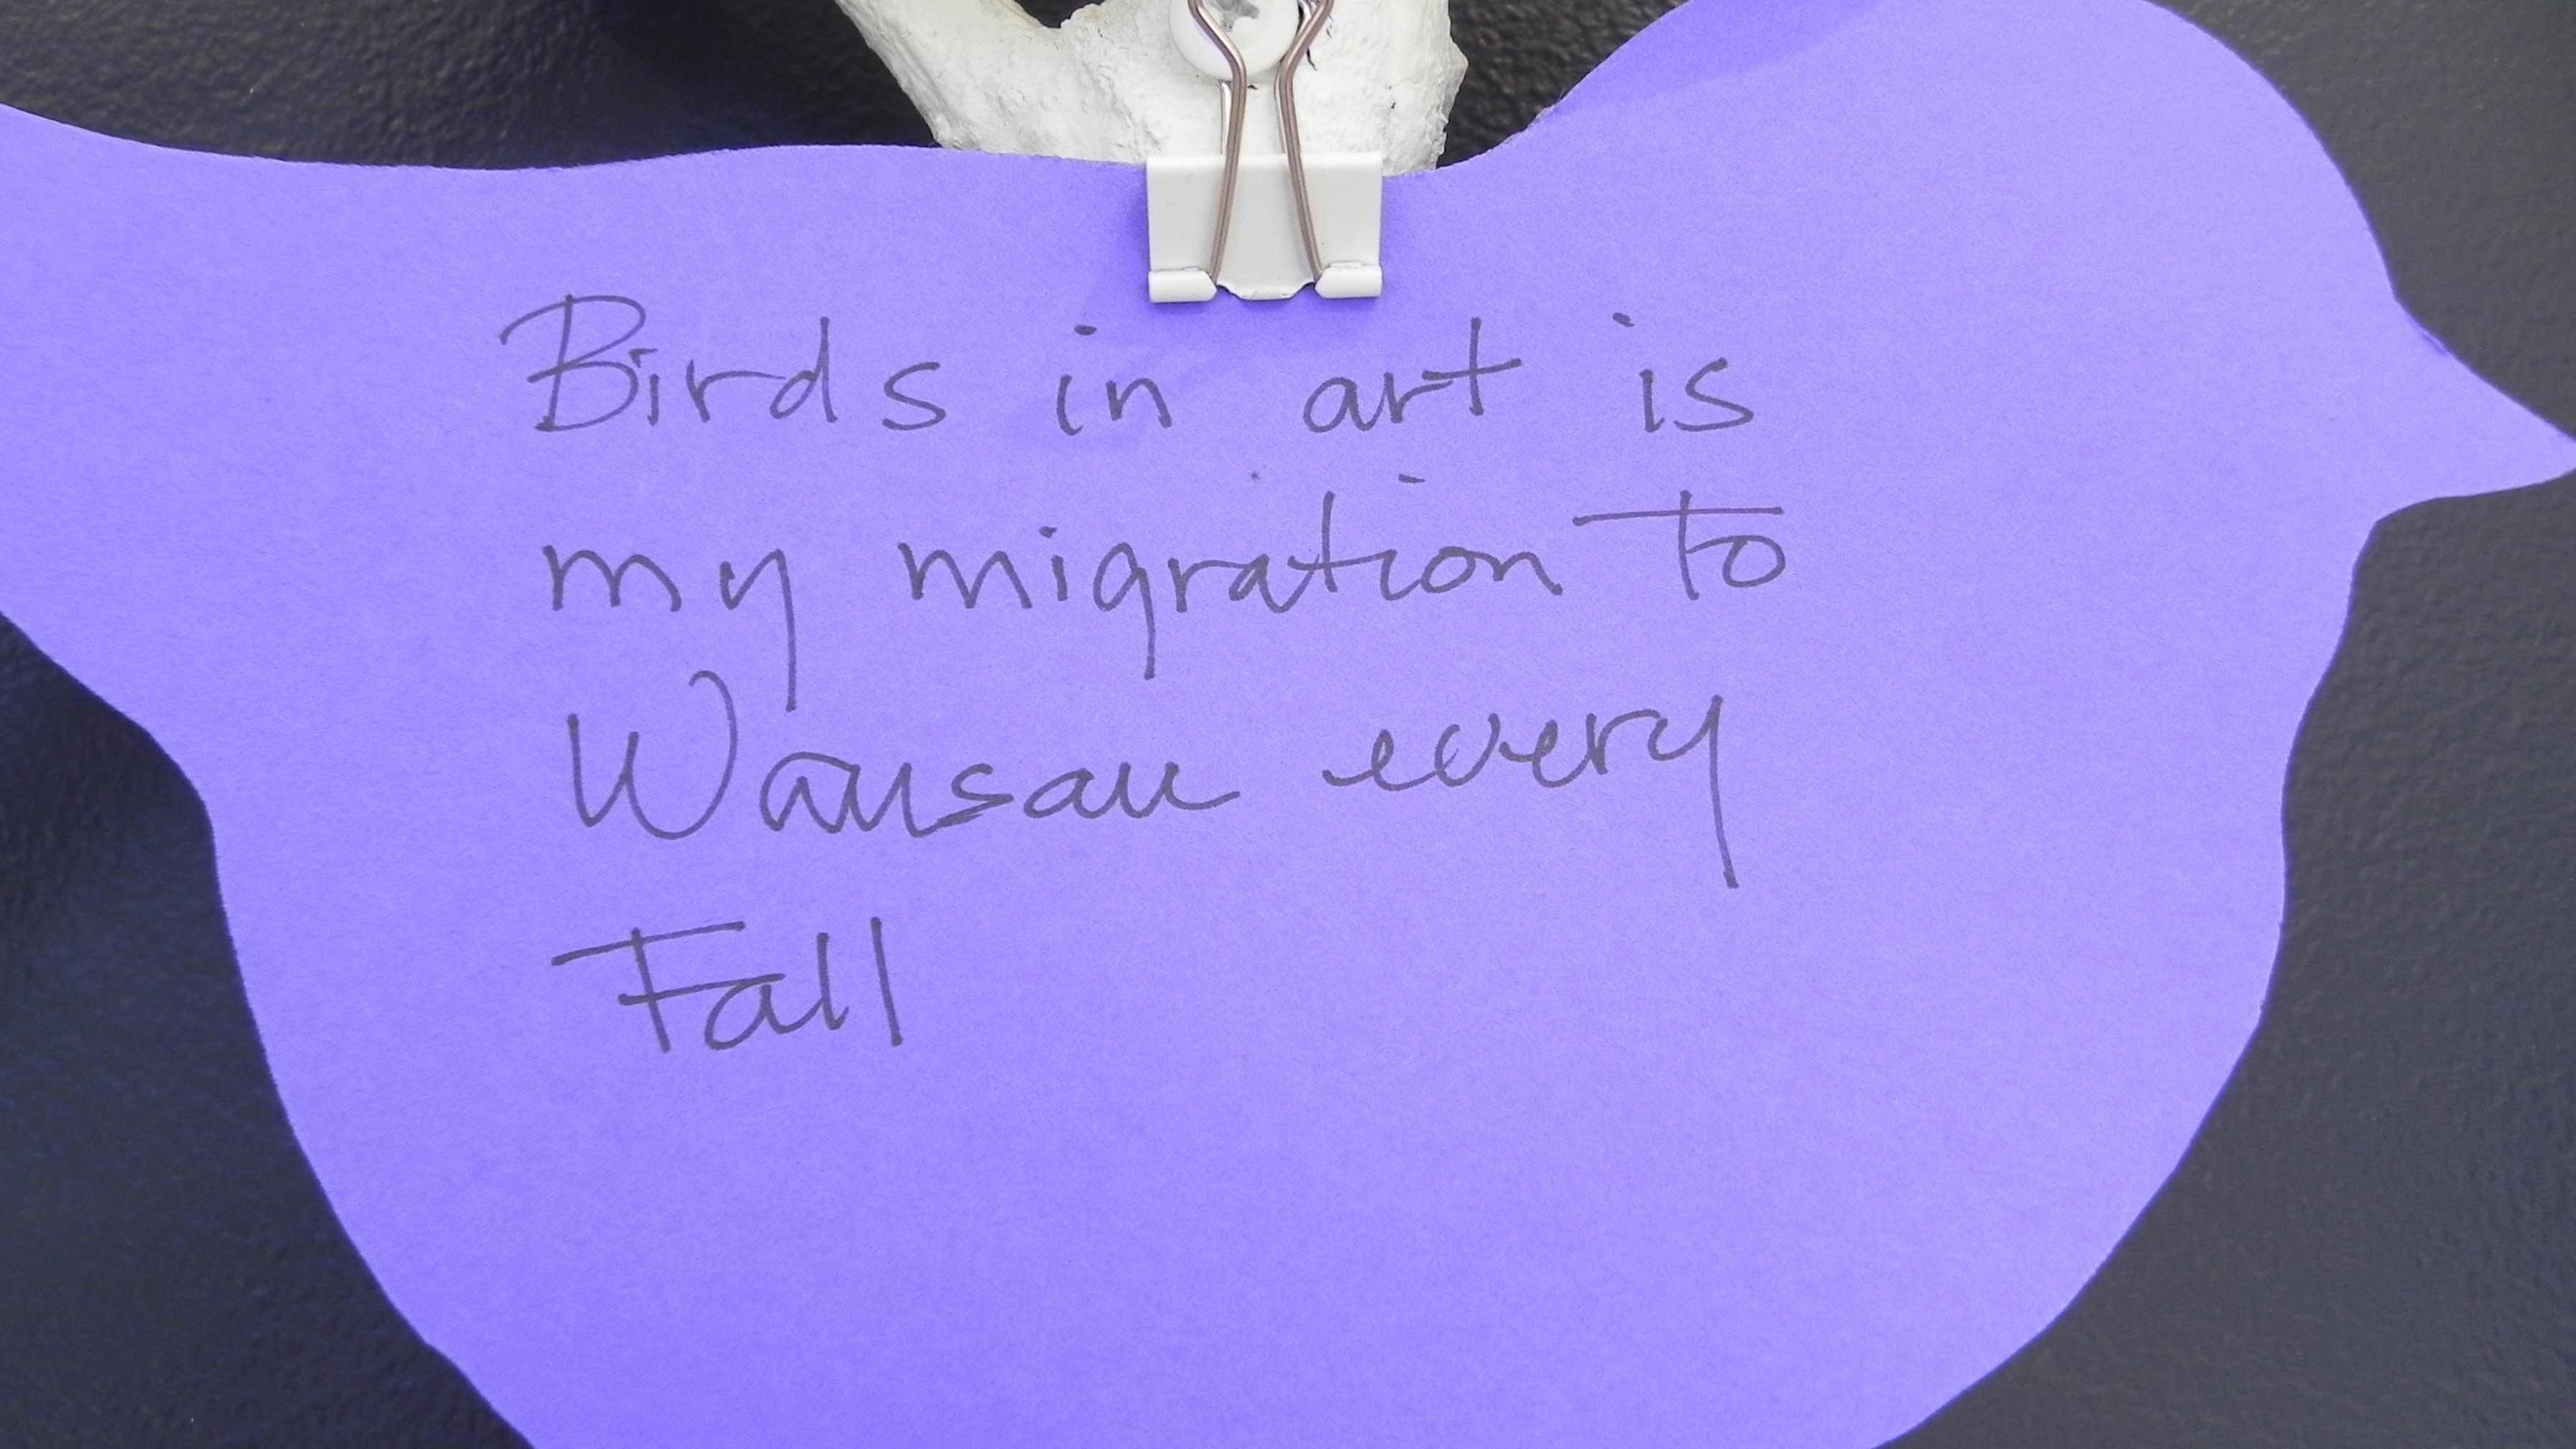 blog10-7-15FallMigration